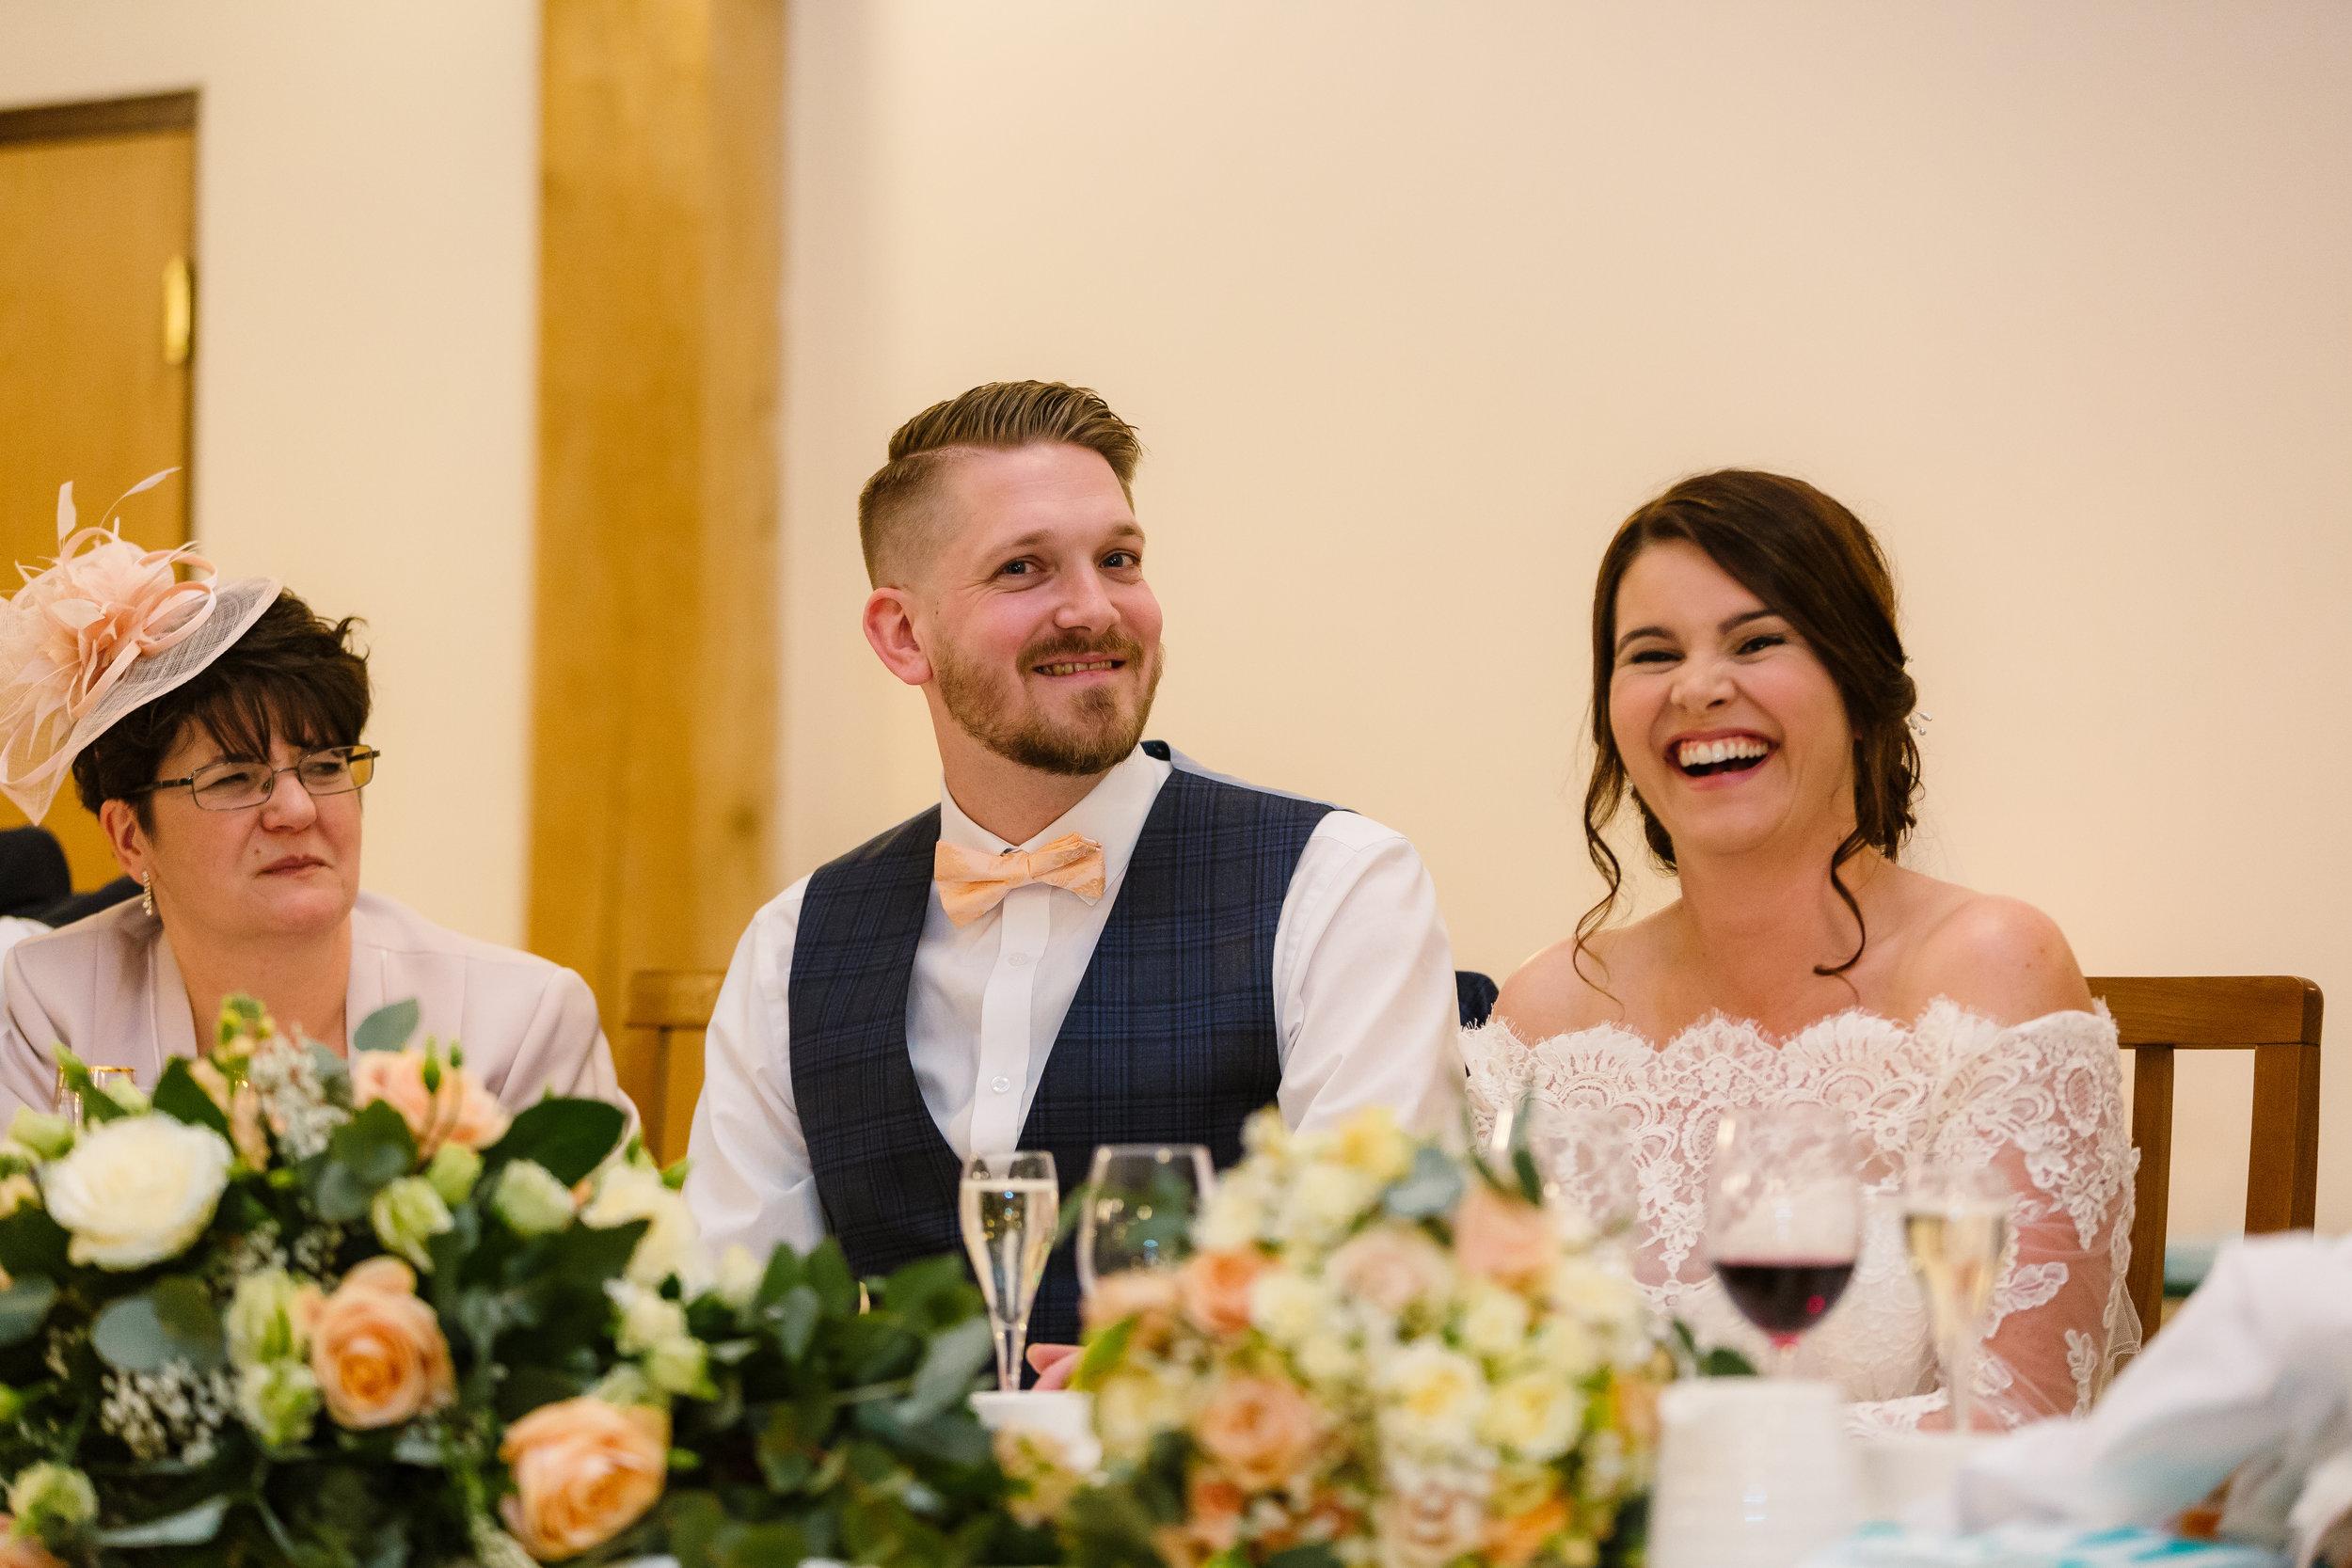 Sarah-Fishlock-Photography-Hampshire-wedding-photographer-hampshire / fleet-wedding-photographer-fleet / hampshire-barn-wedding-venue / hampshire-wedding-venue / rivervale-barn / wedding-in-snow